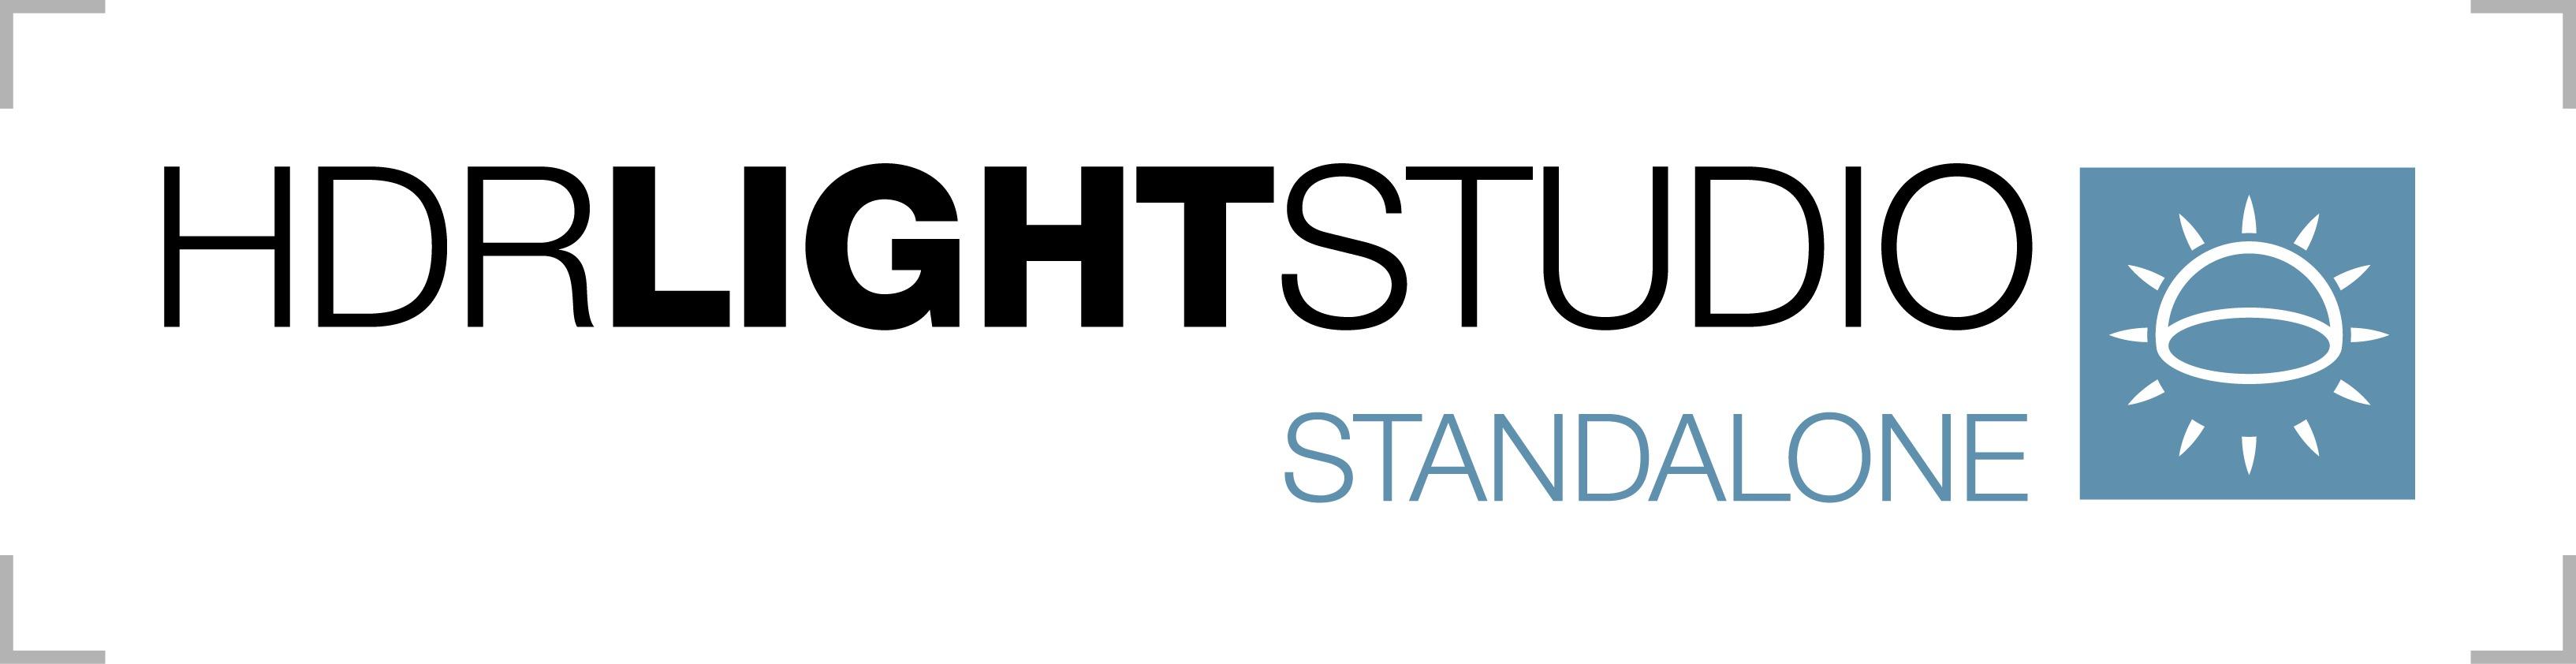 Lightmap HDR Light Studio - Standalone (node-locked, permanent license) - vendor logo 1